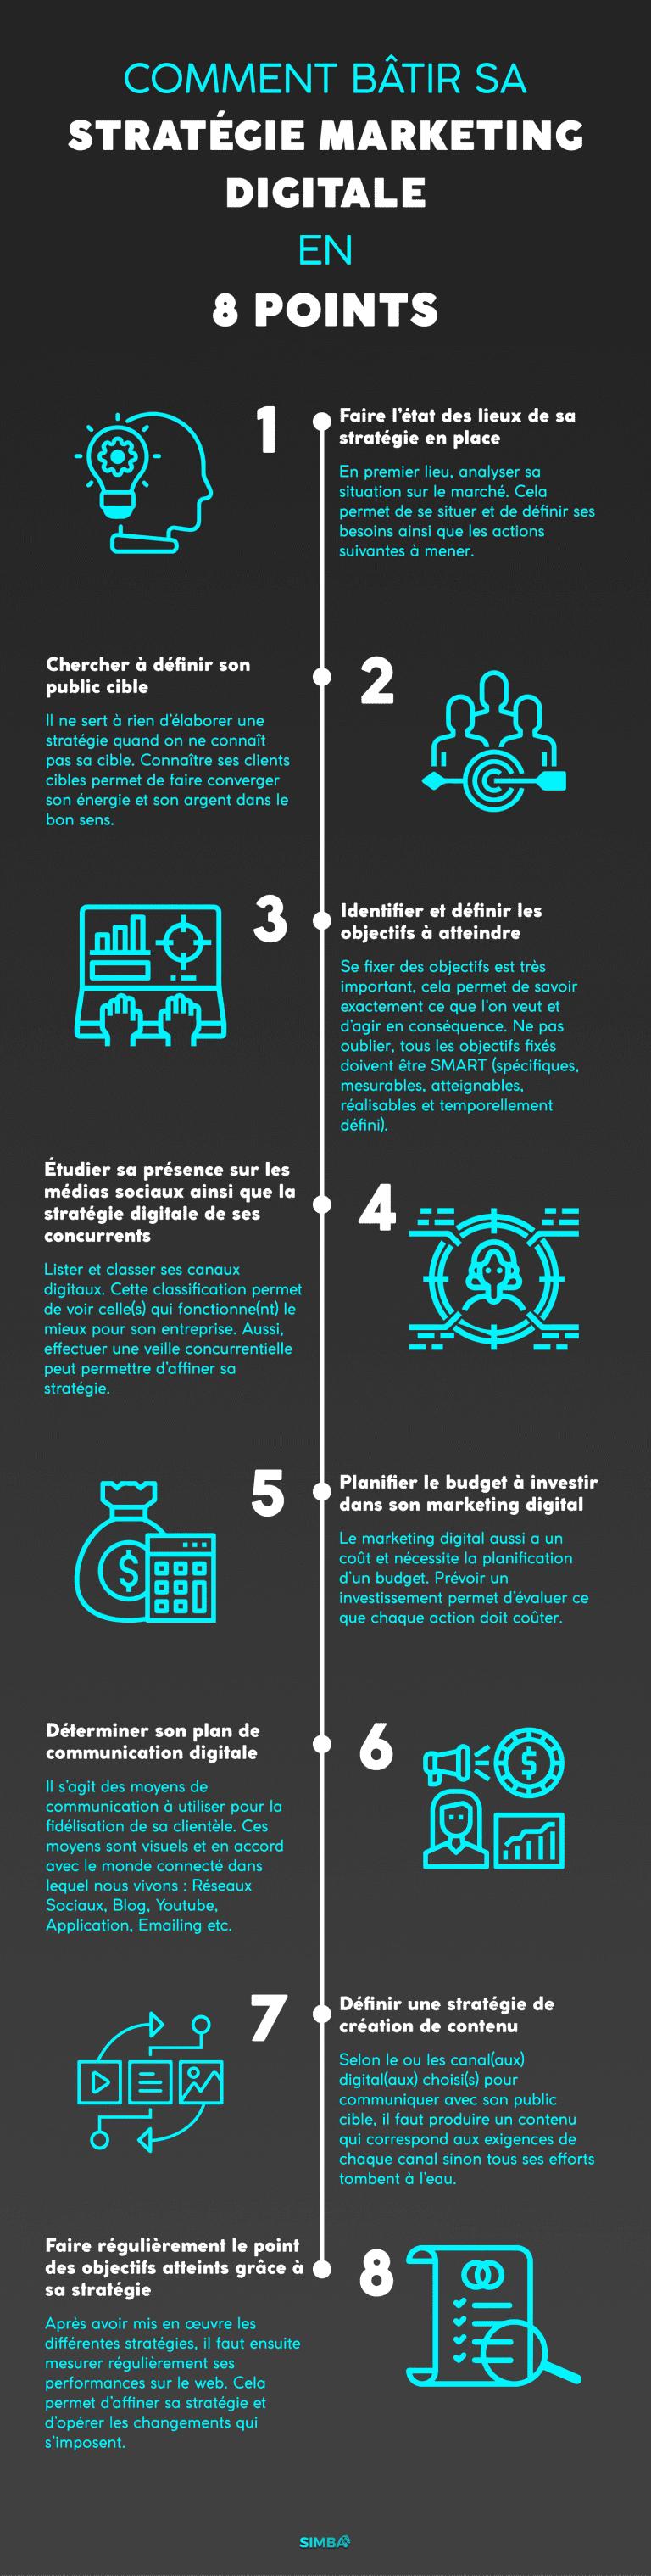 Infographie Strategie Marketing Digital